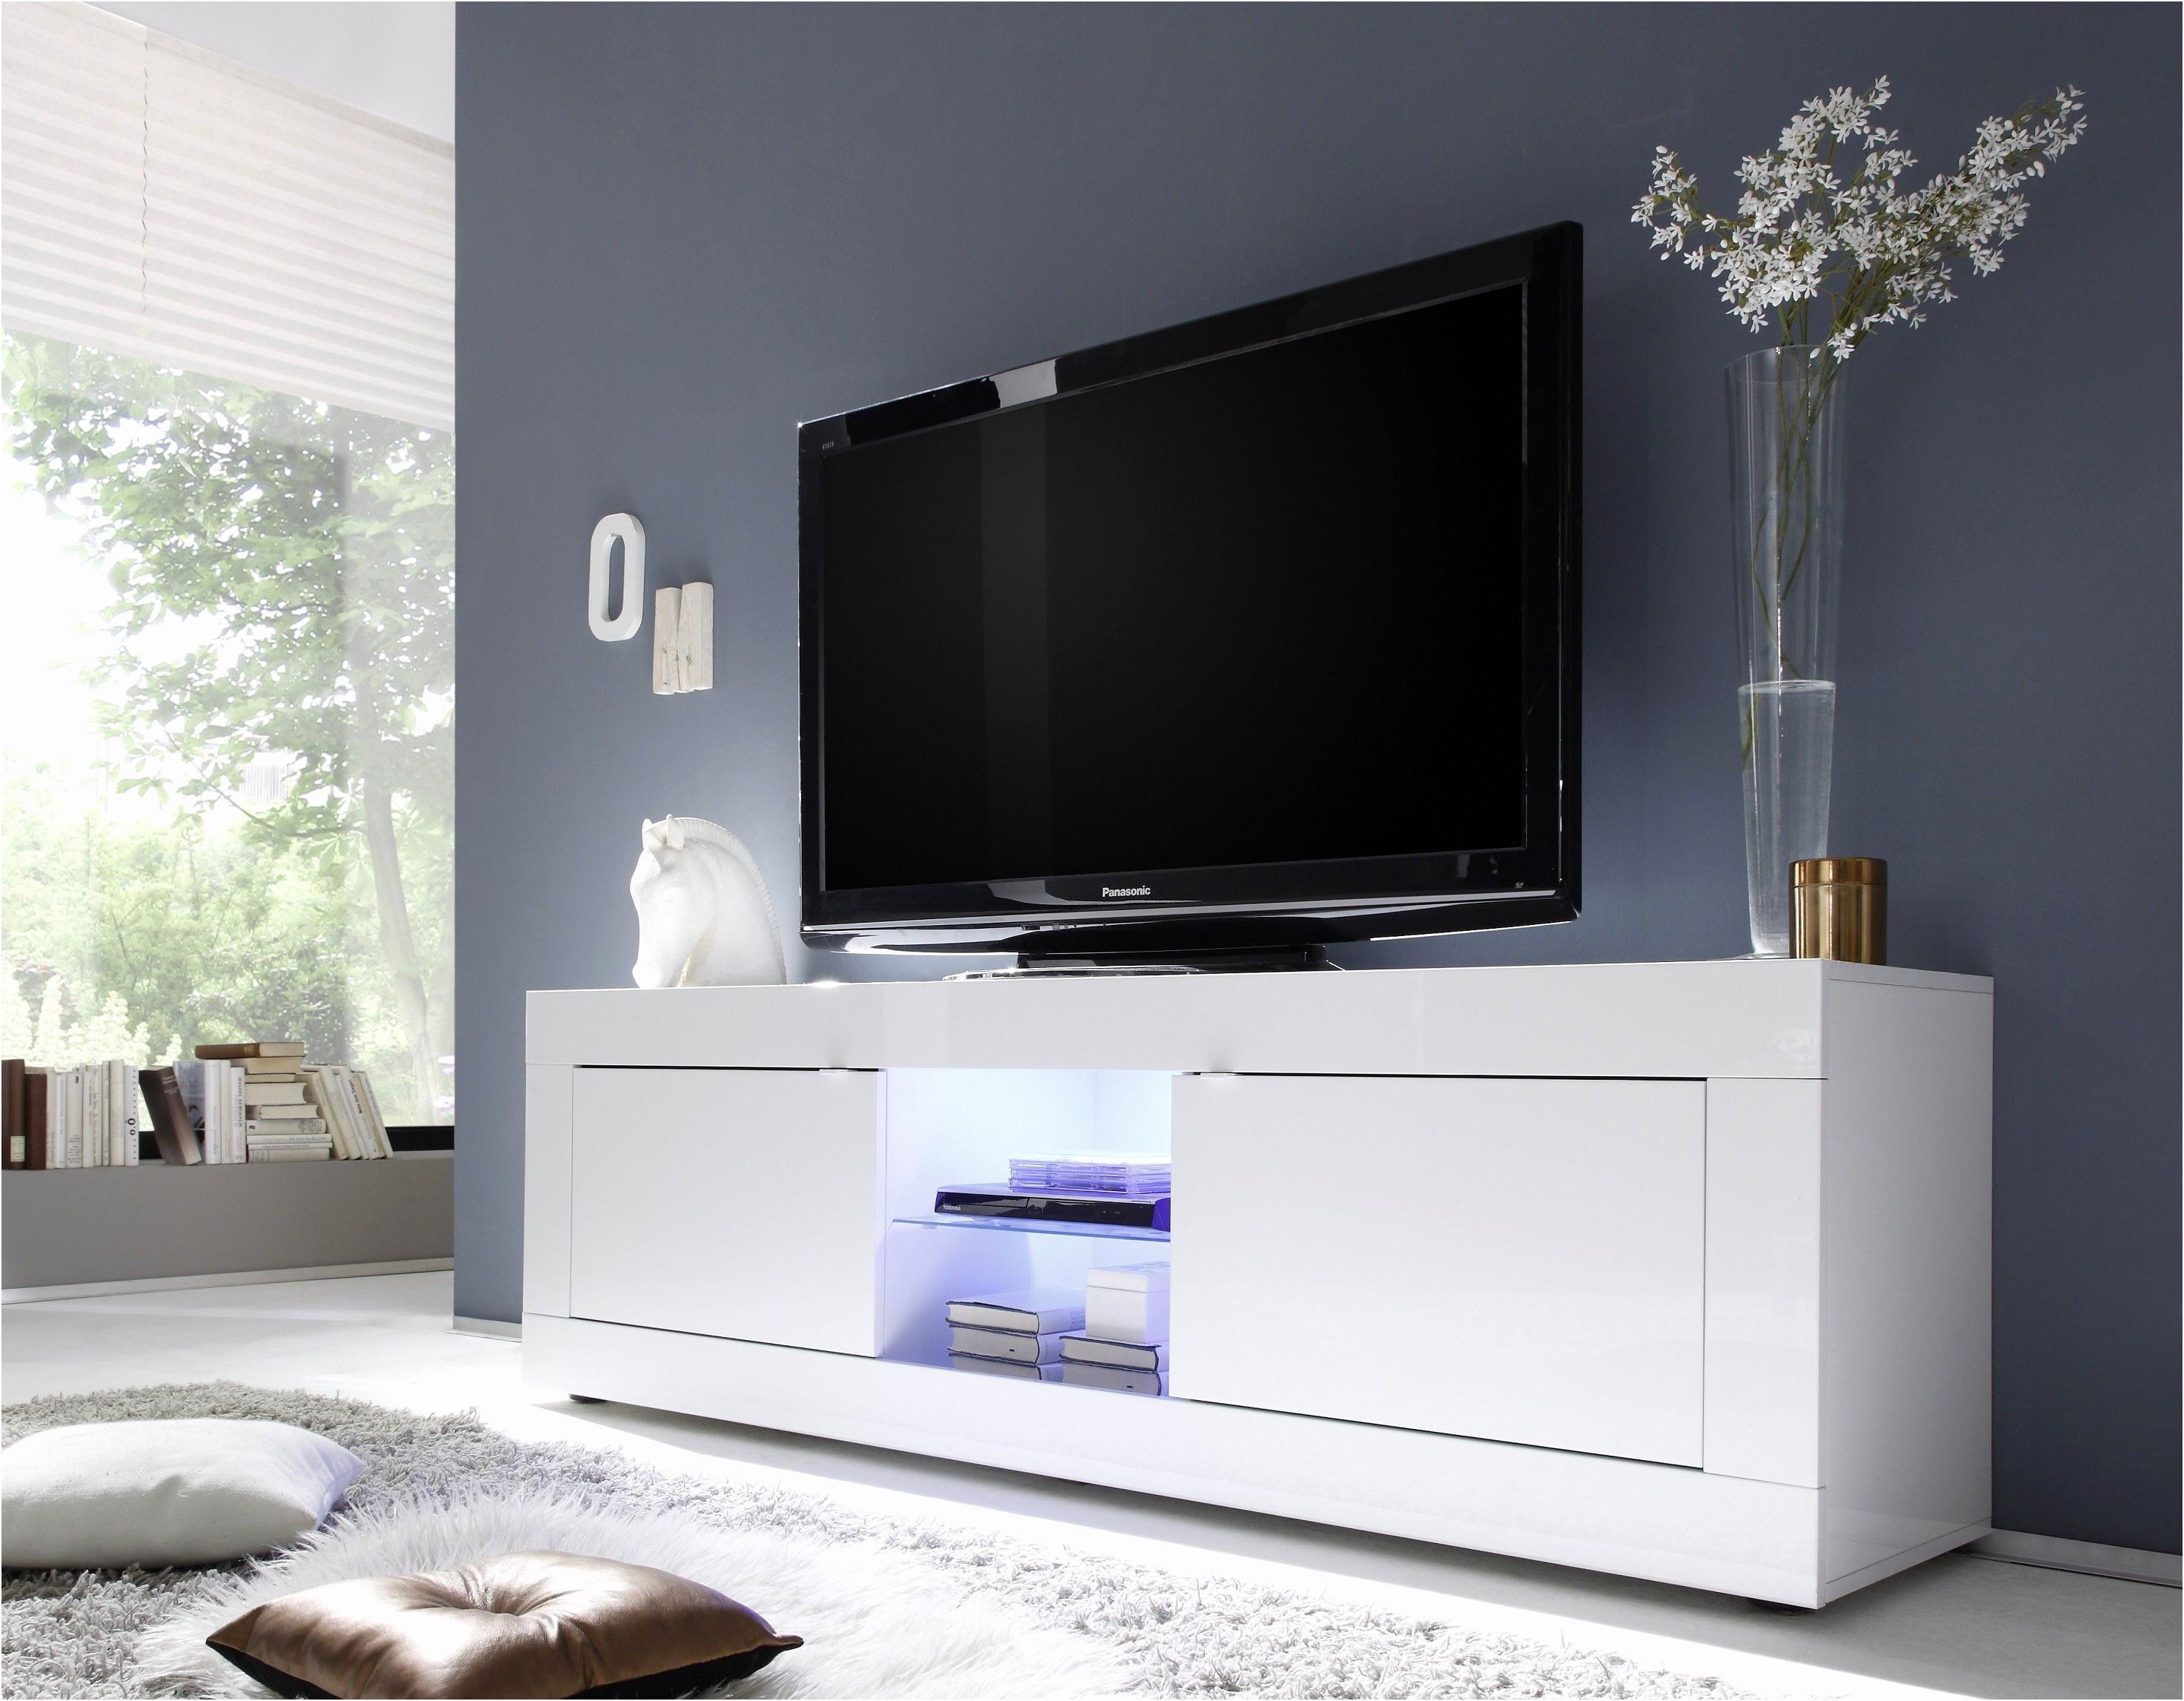 Meuble Blanc Conforama Frais Meuble Tv Laqu Blanc Tout Meuble Tele Conforama Agencecormierdelauniere Com Agencecormierdelauniere Com